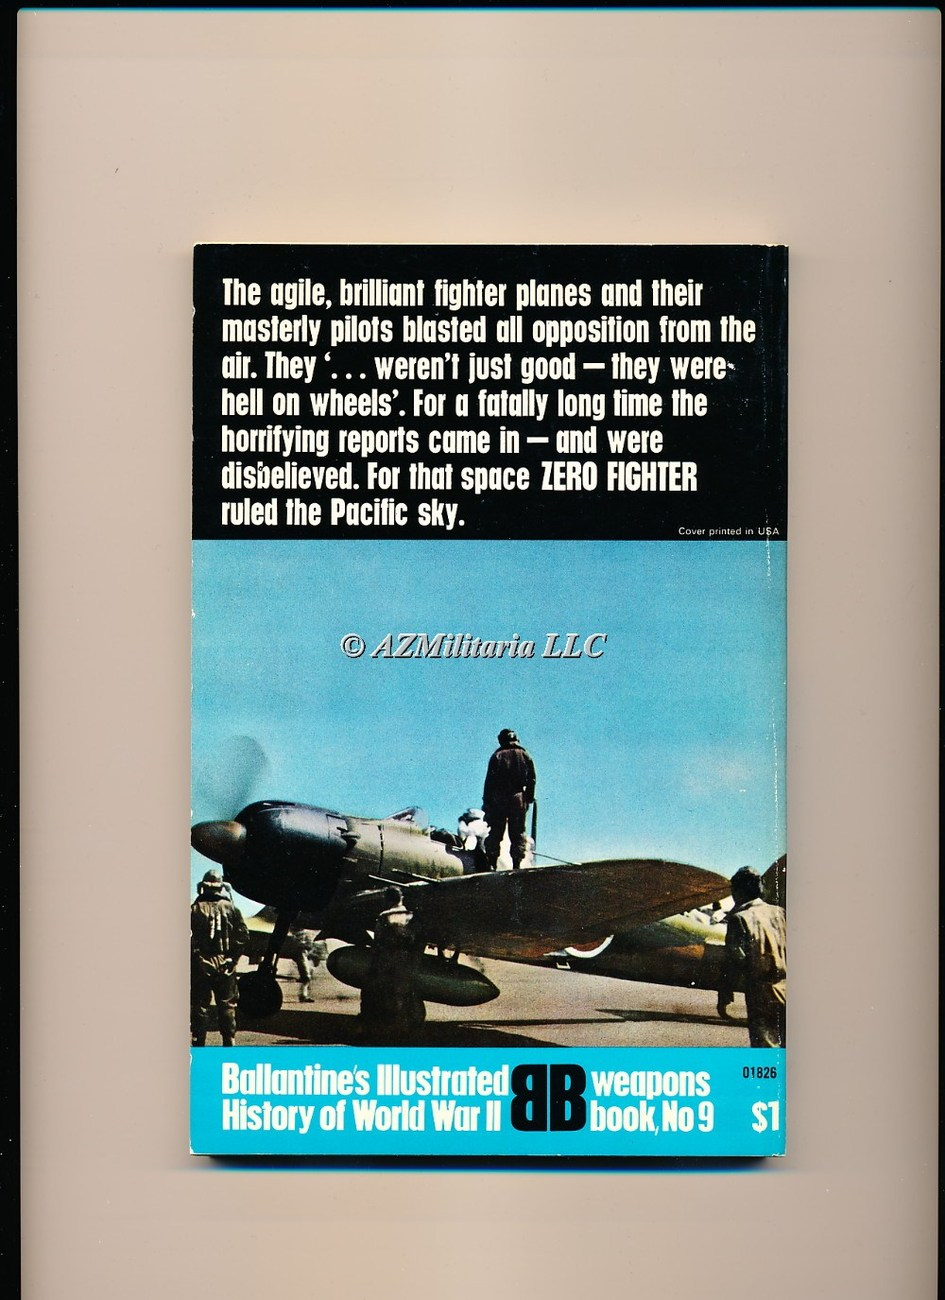 Zero Fighter (Weapons Book, No 9)